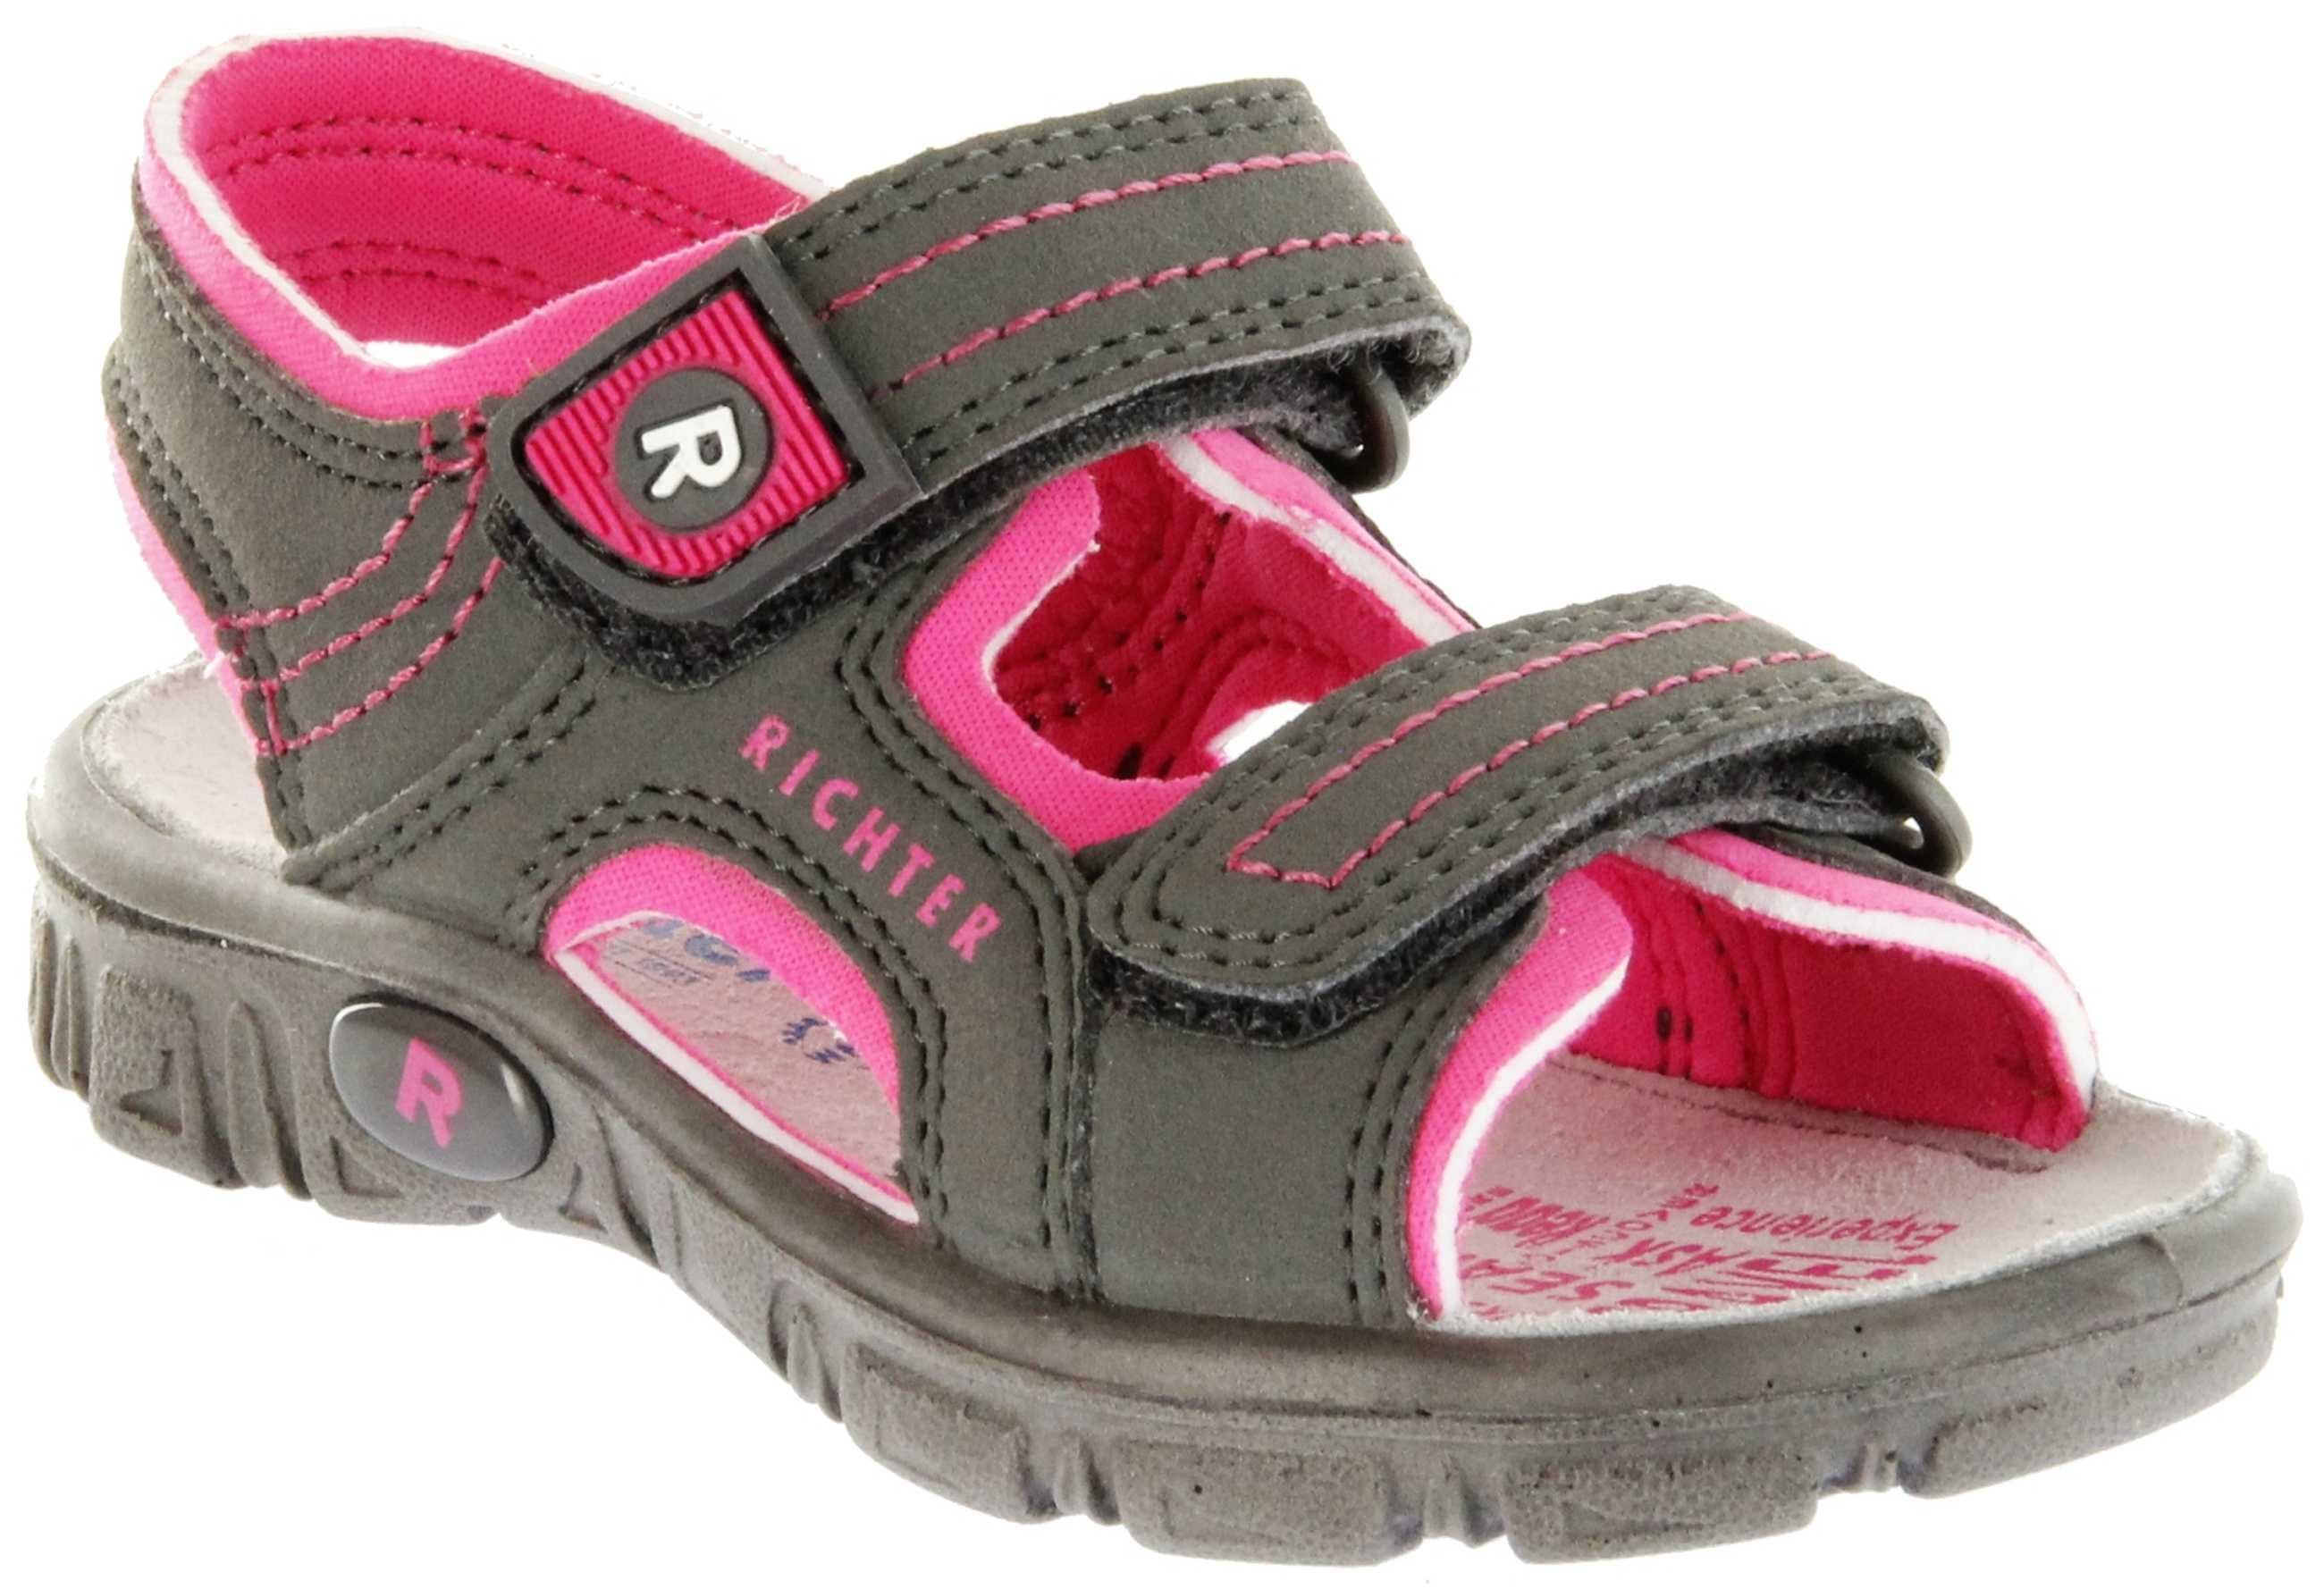 Kinder Lederdeck 6612 Adventure Sandaletten Pebble 8101 341 Richter Outdoor Grau Mädchen shQrdCtx